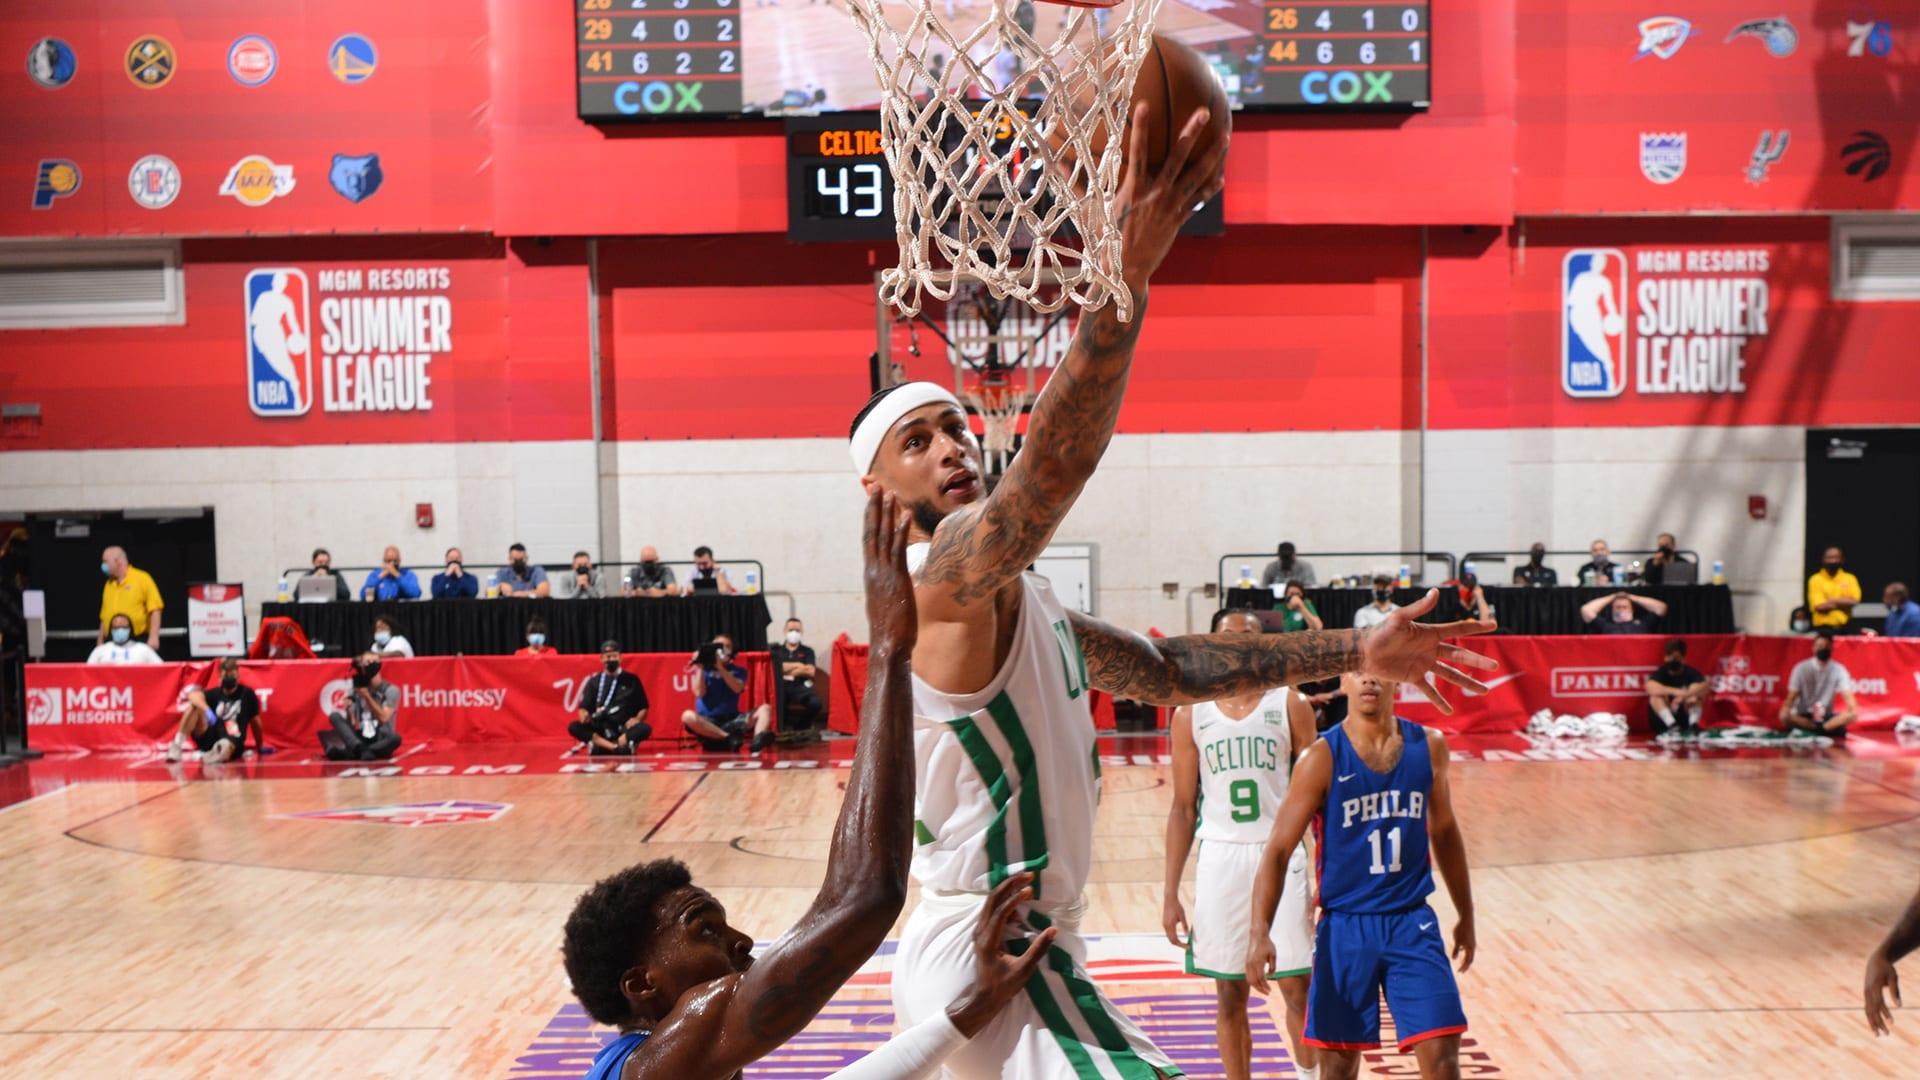 Las Vegas Summer League: Balanced attack helps Celtics rout 76ers